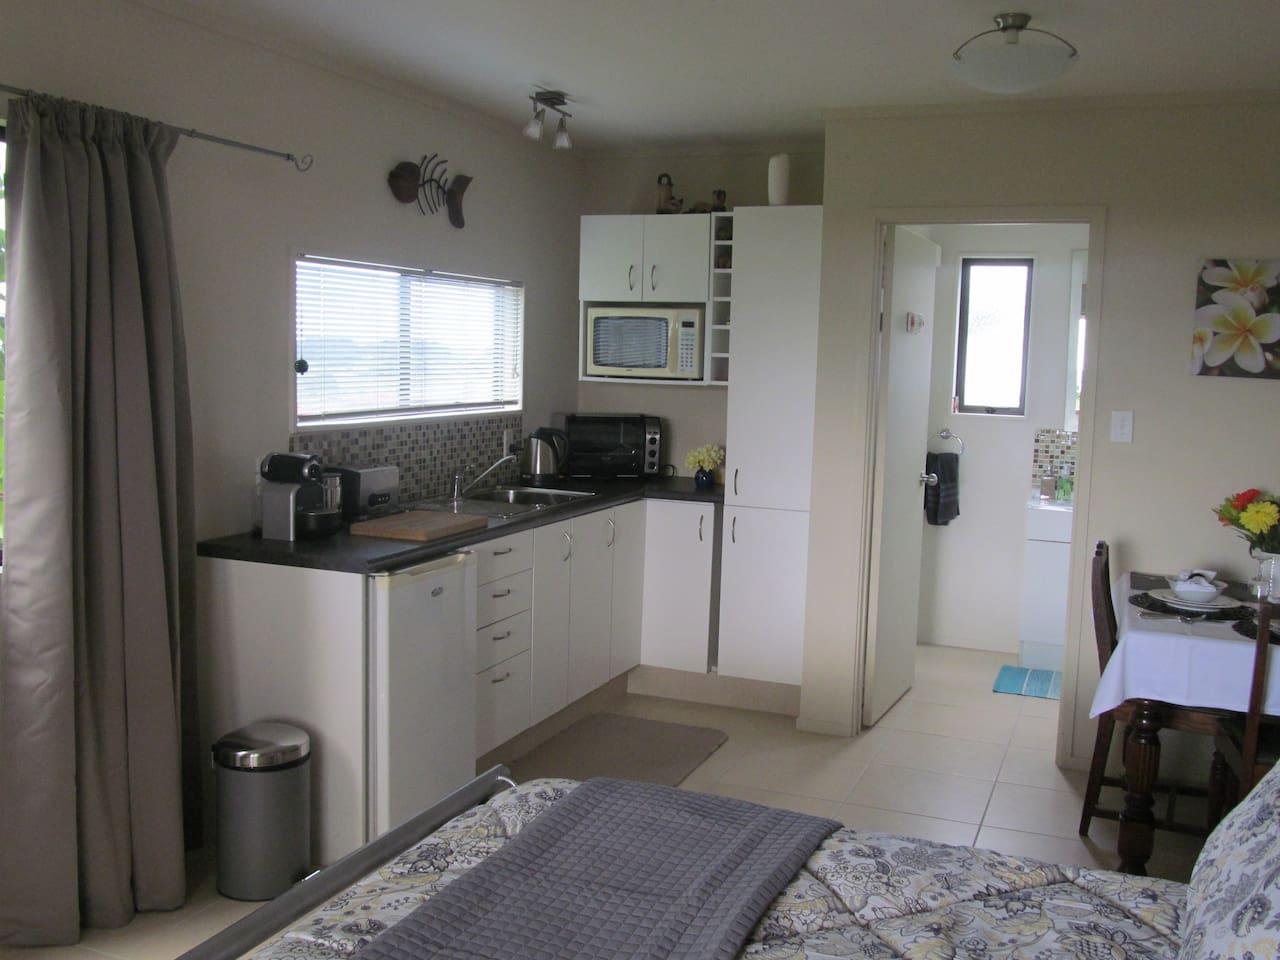 Open plan showing kitchen